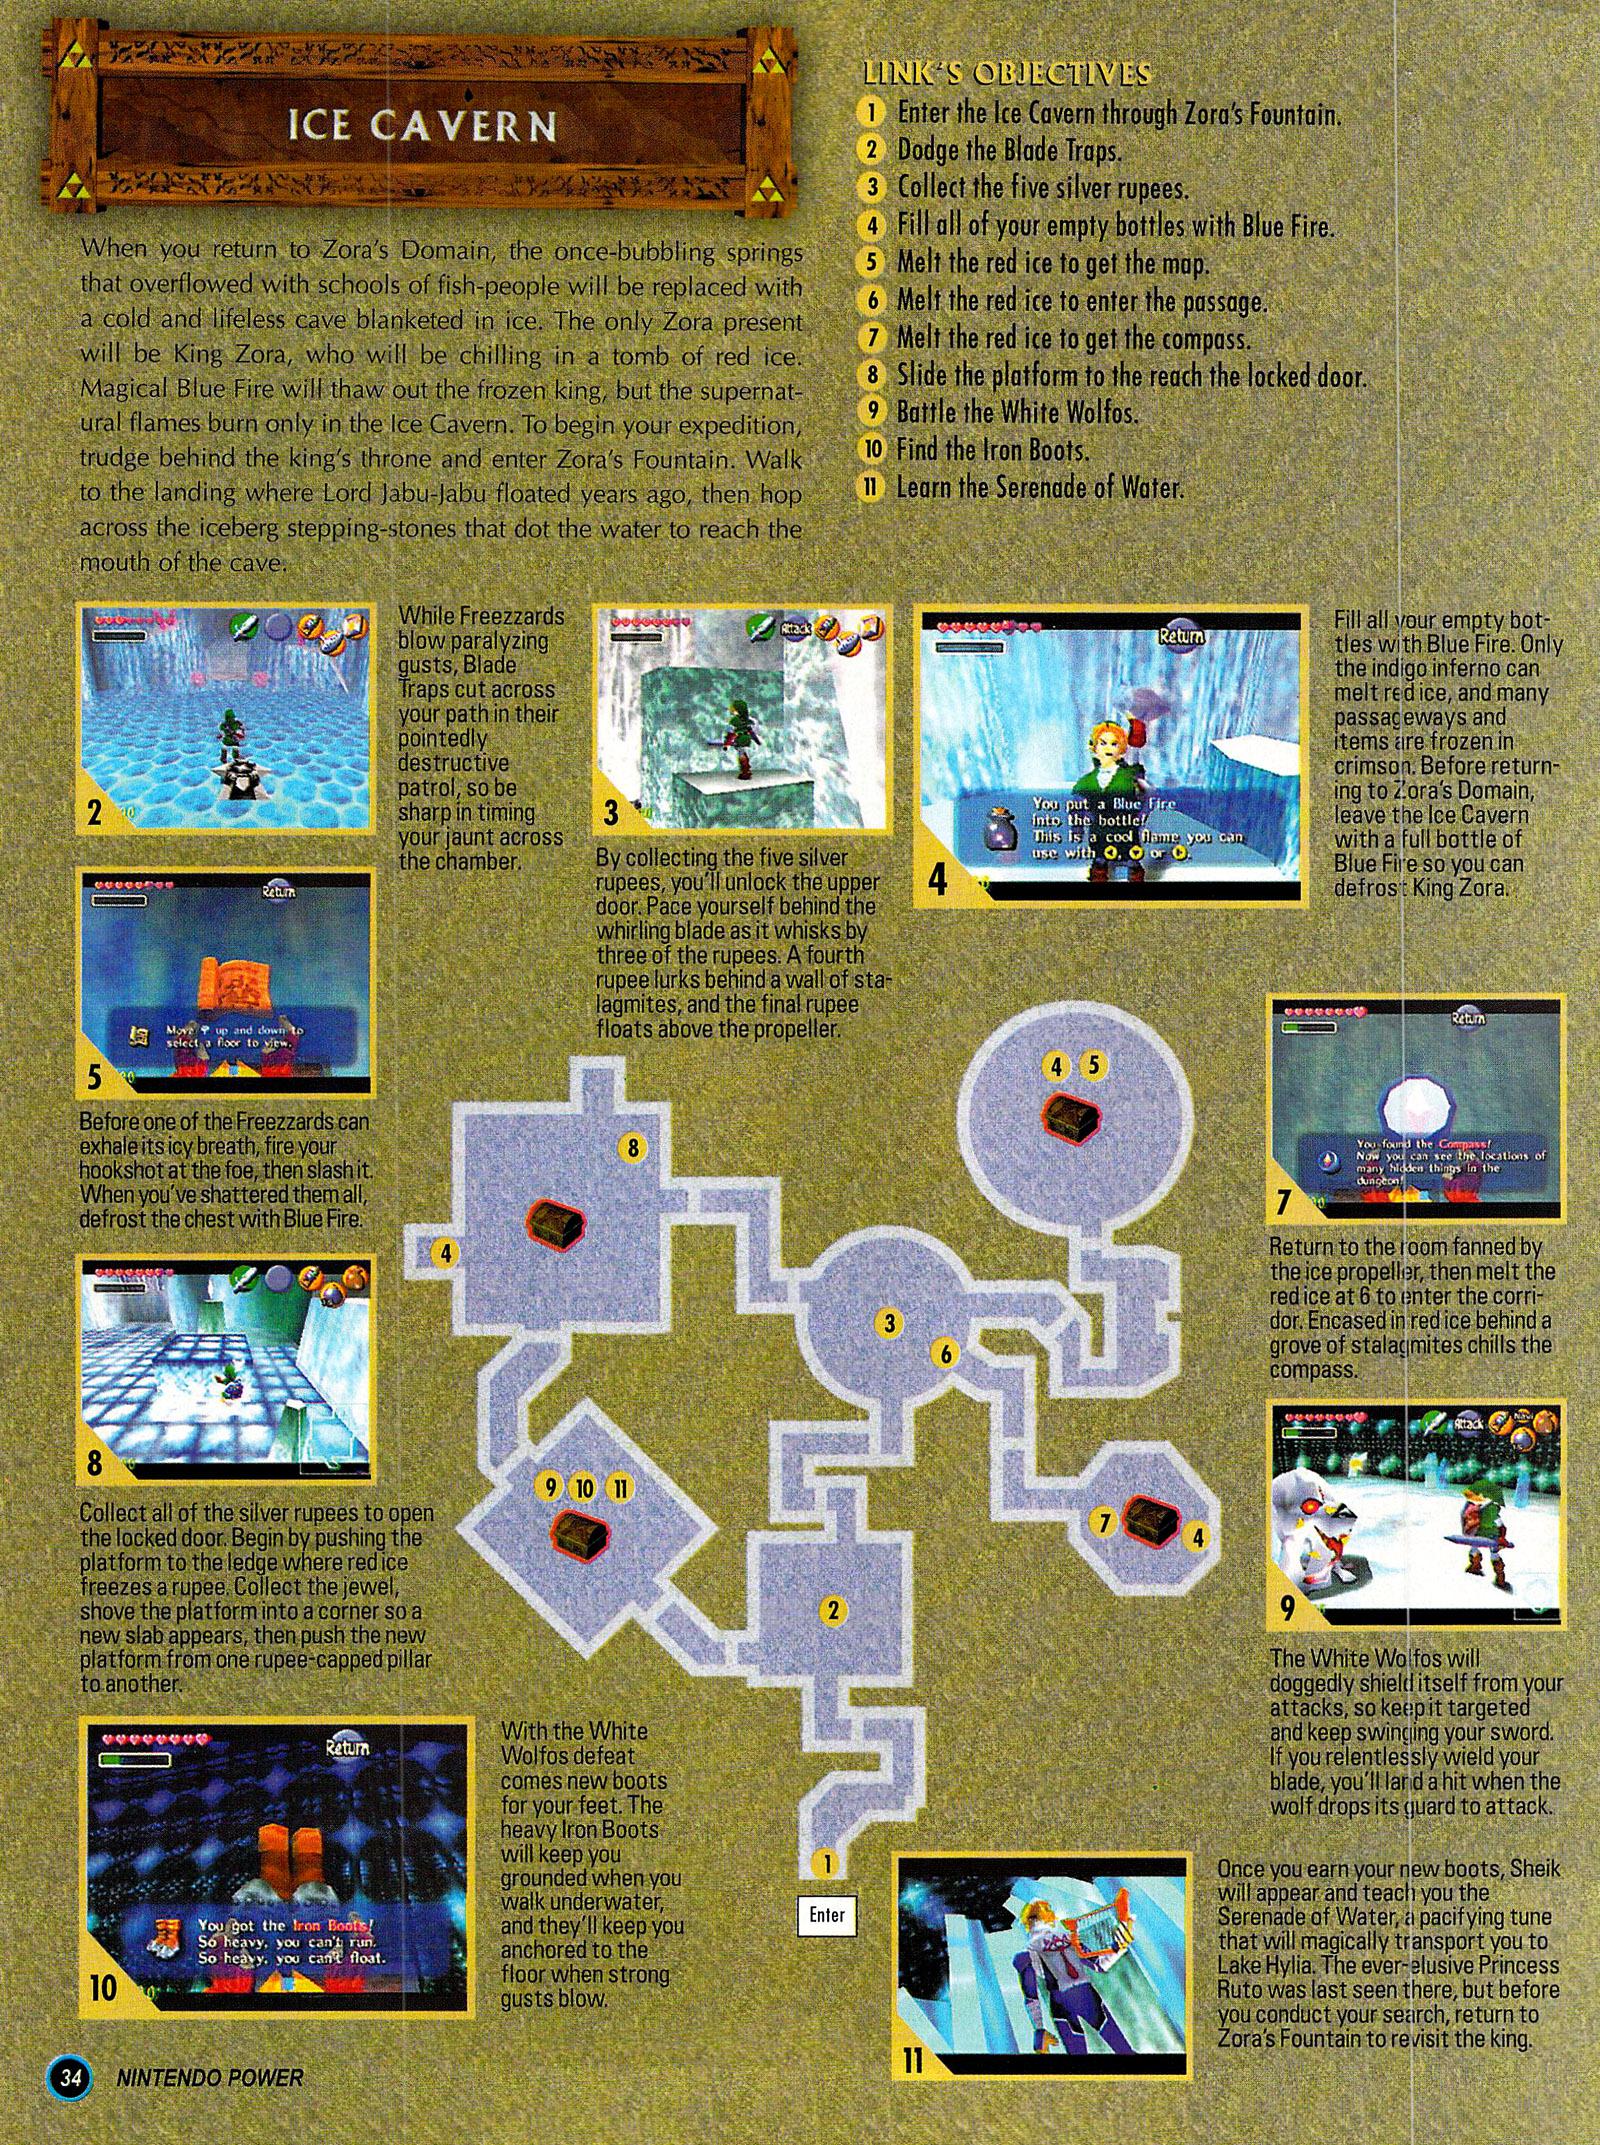 Nintendo Power #115 - Read Nintendo Power Issue #115 Online